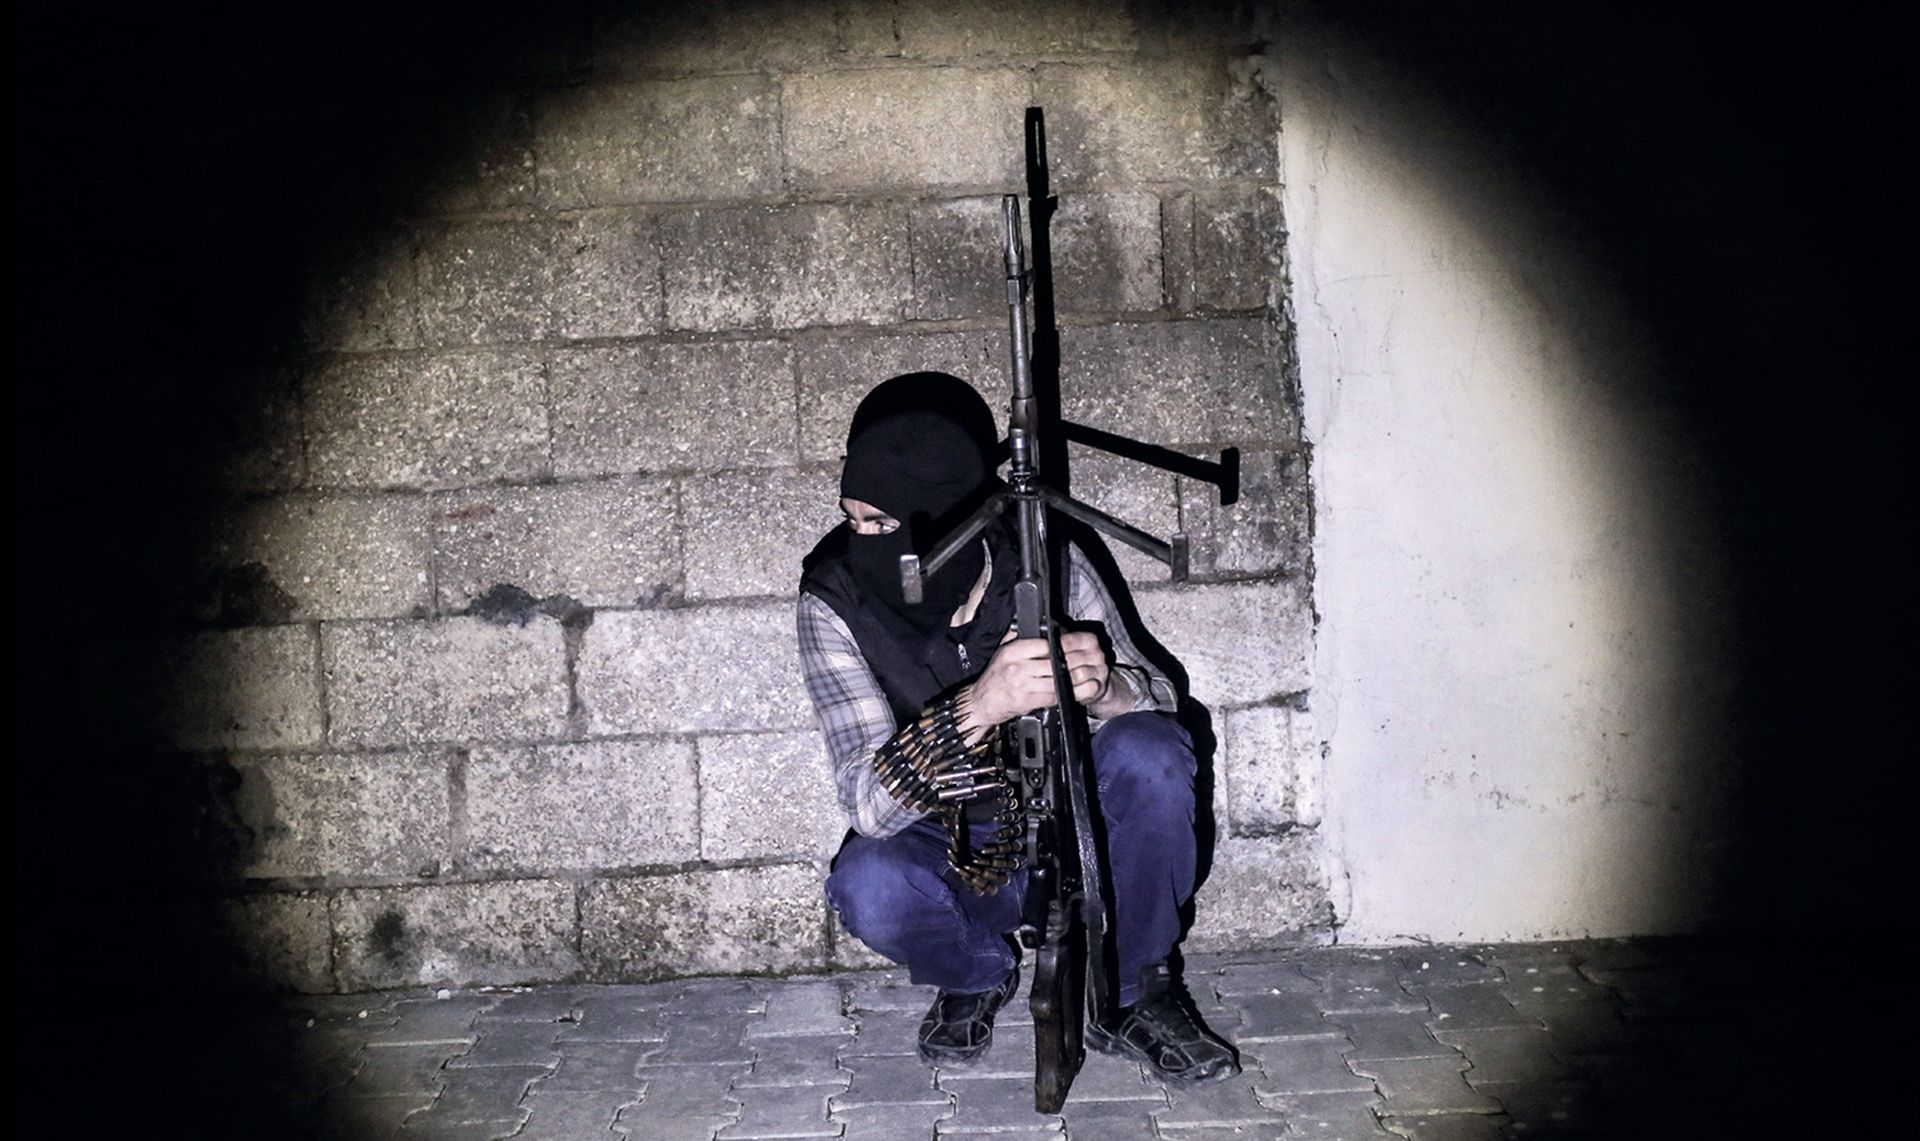 Talijanska mafija prezrena zbog suradnje s teroristima